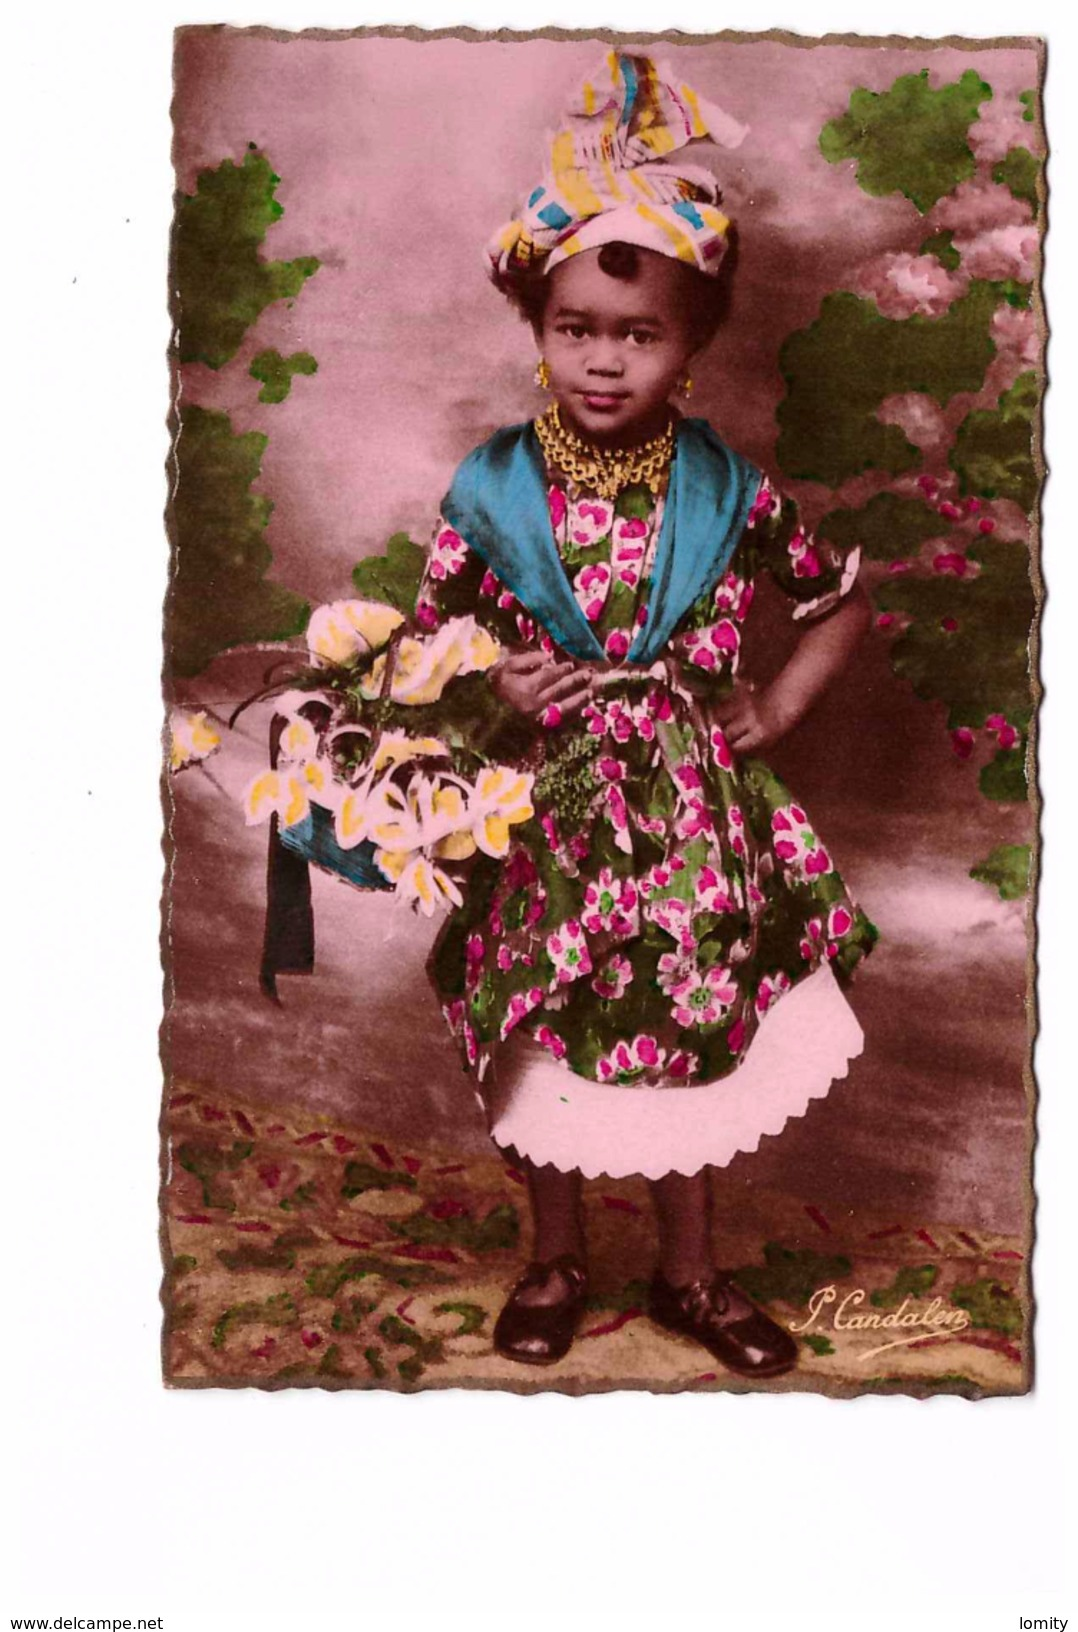 Guadeloupe Petite Creole - Guadeloupe